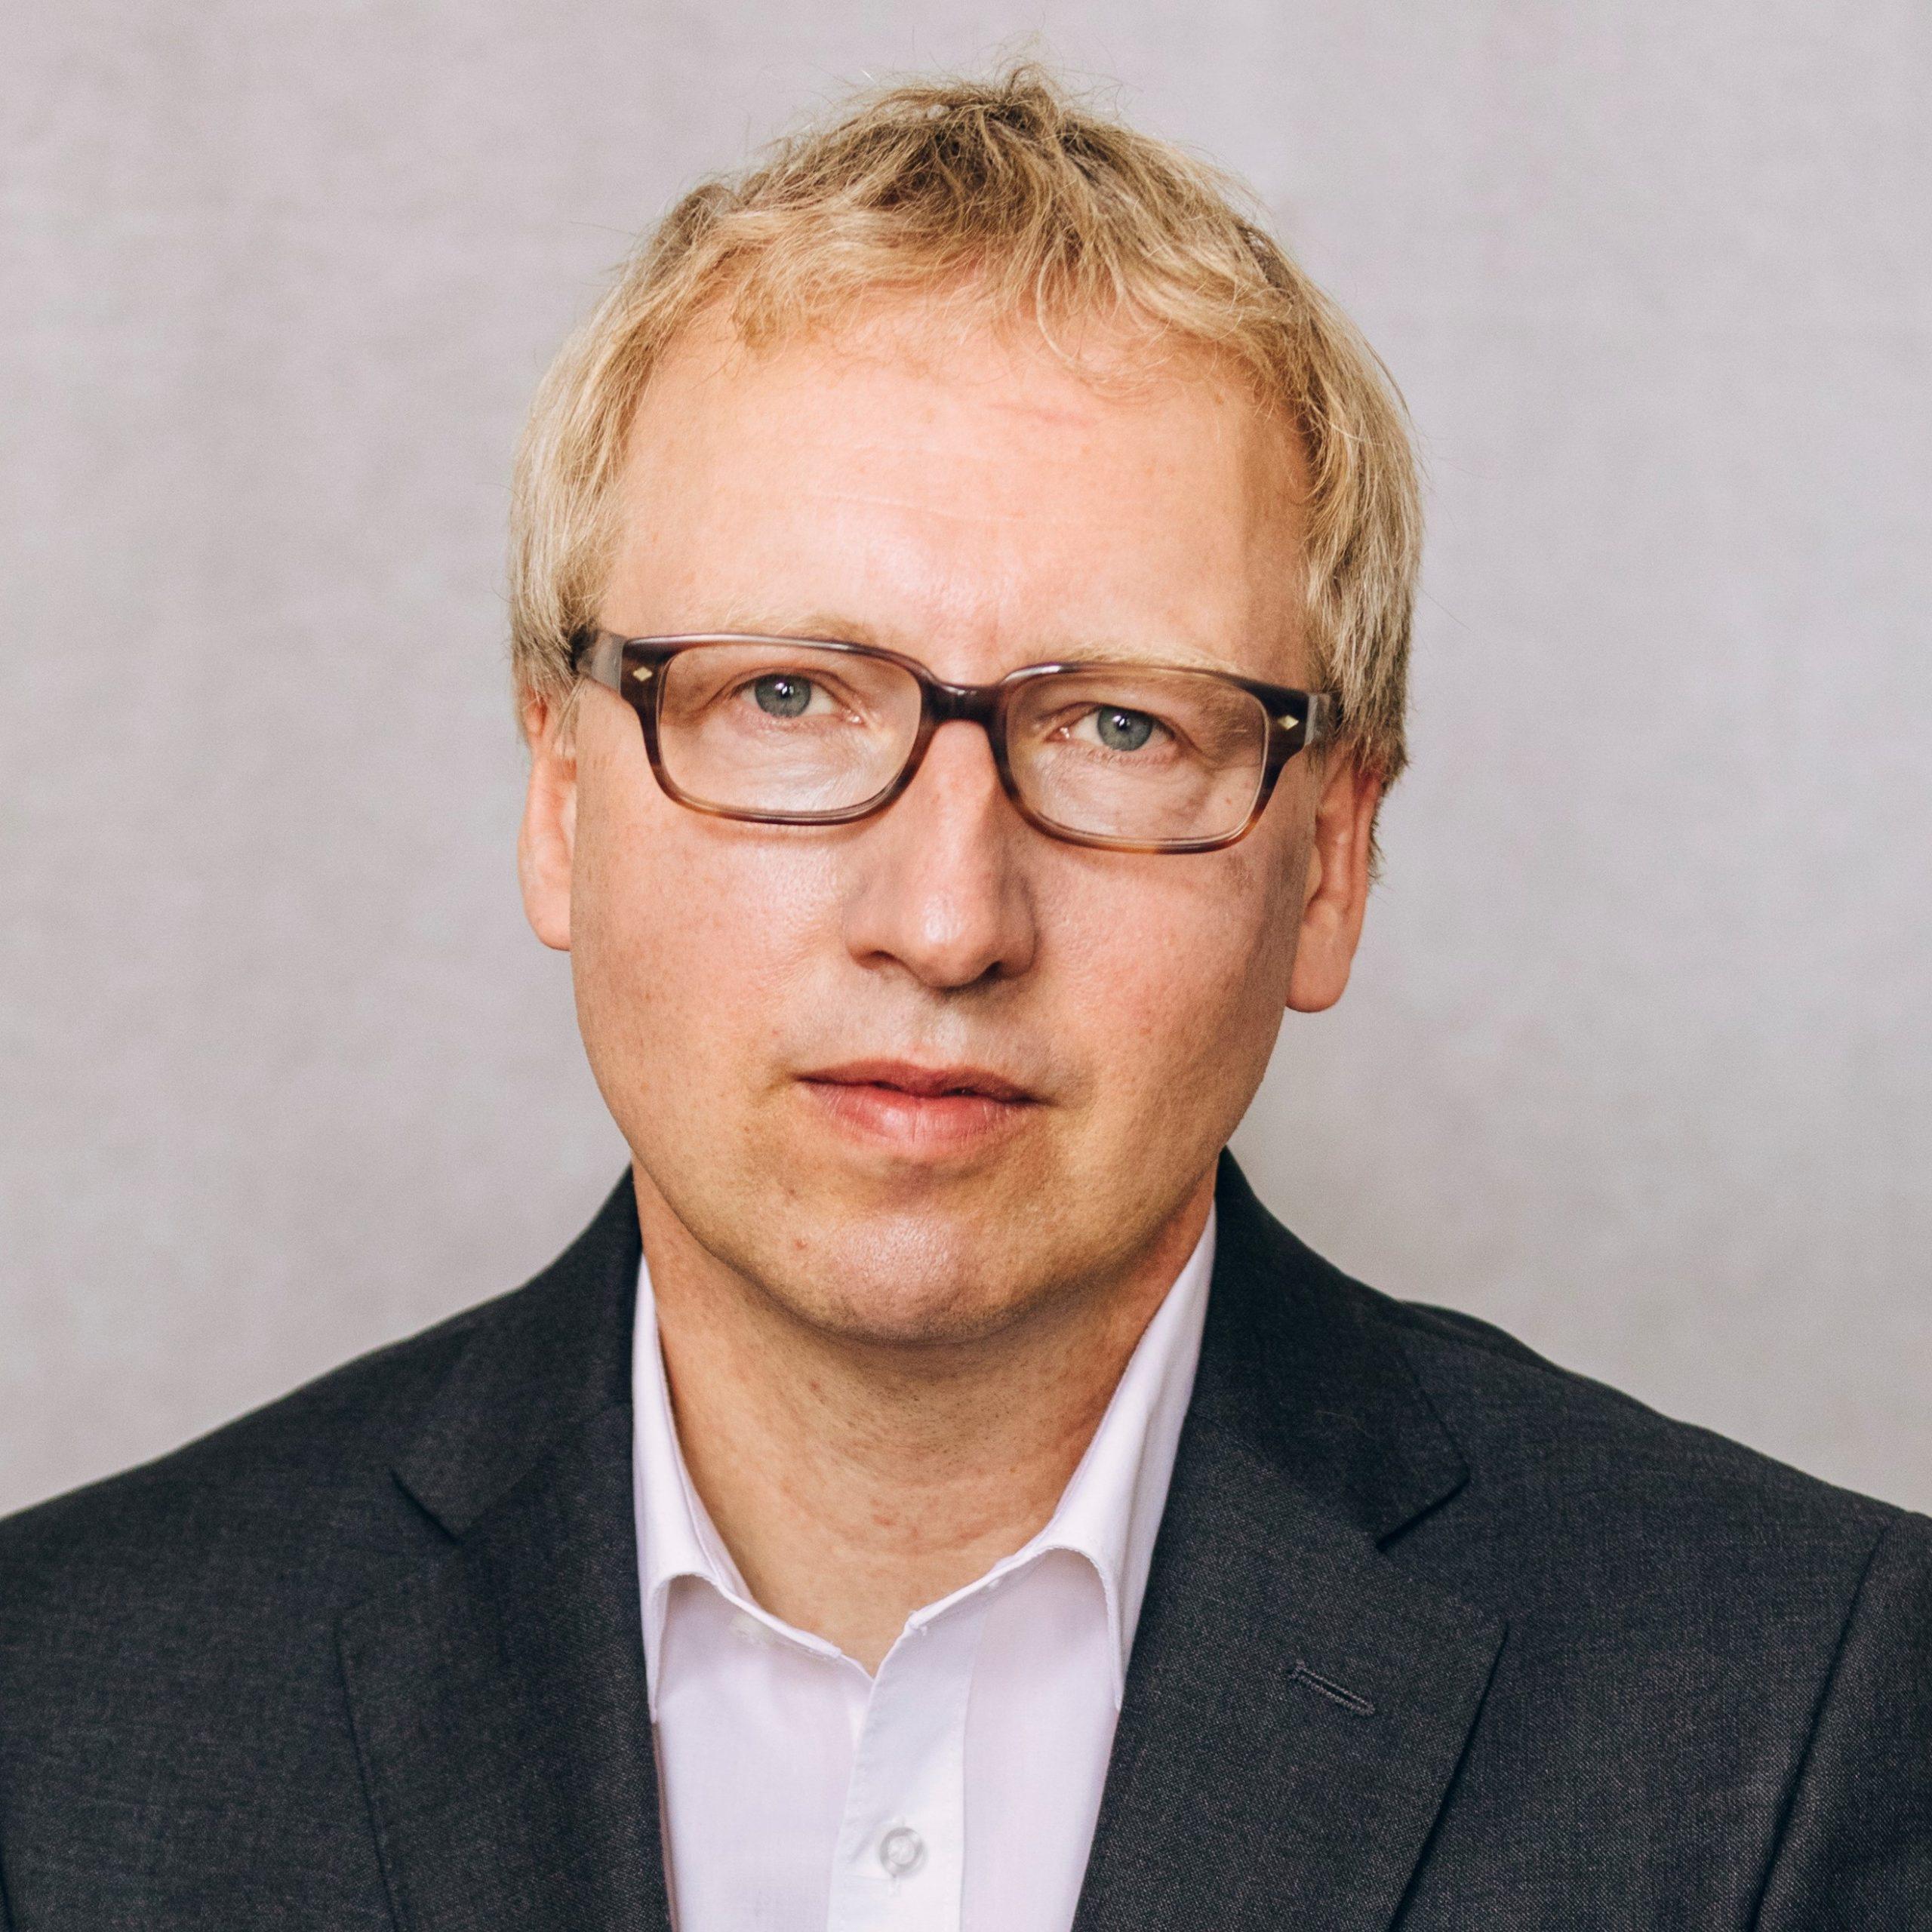 Prof. Dr. Johannes Varwick